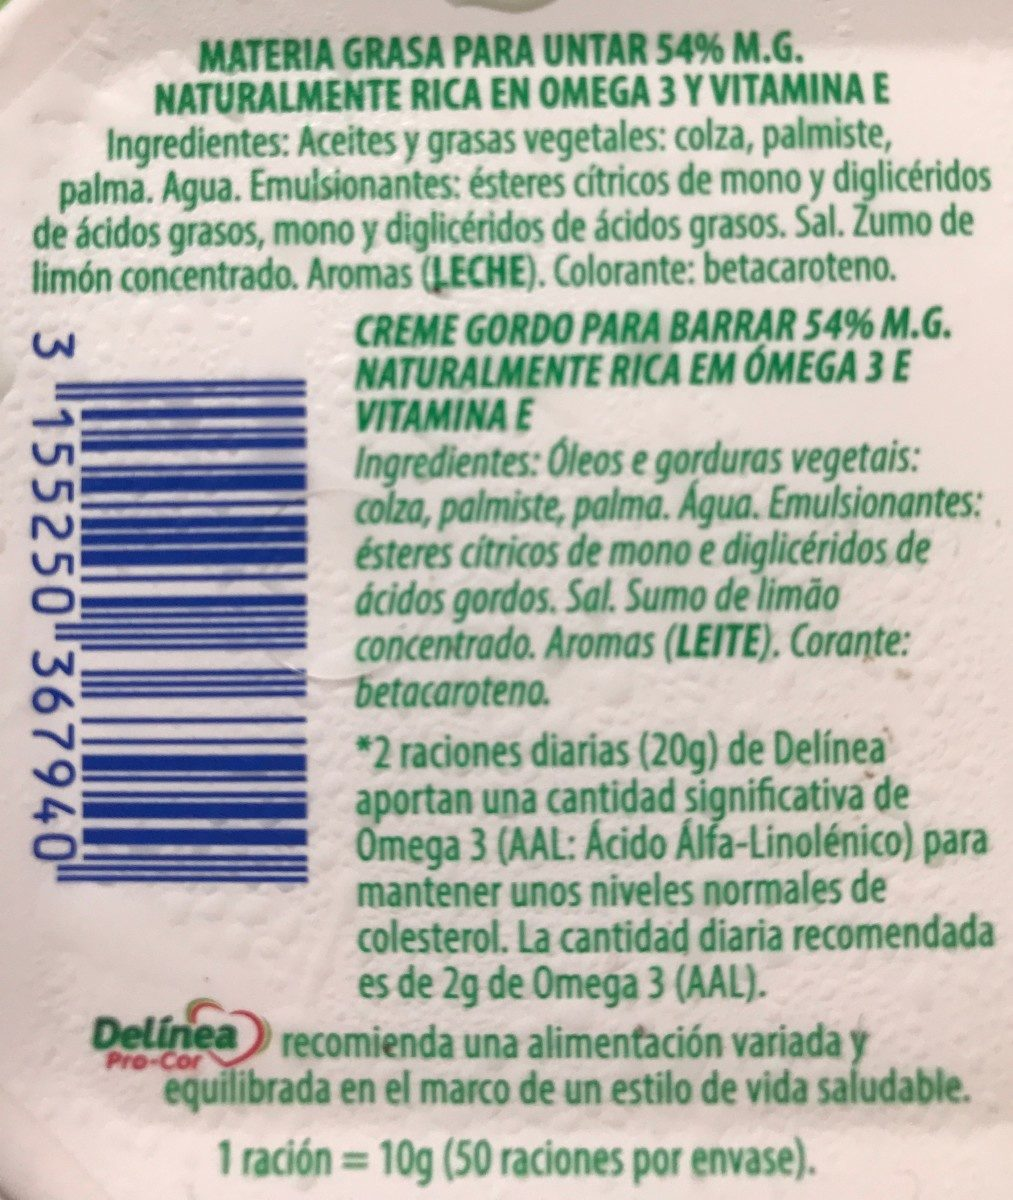 Margarina Delinea Omg3 - Ingredientes - fr